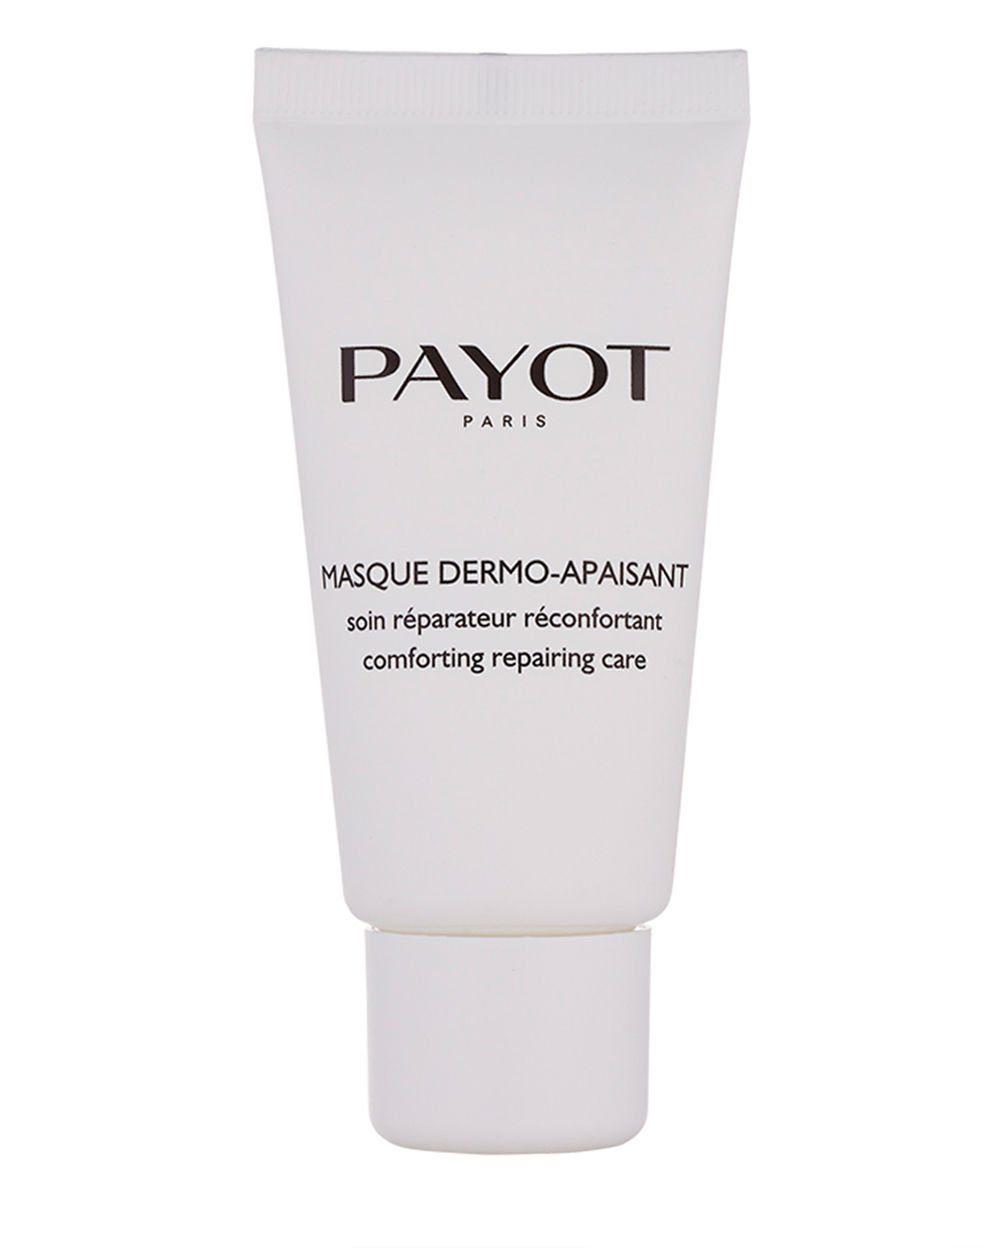 Payot Feuchtigkeitspflege »Masque Dermo-Apaisant«